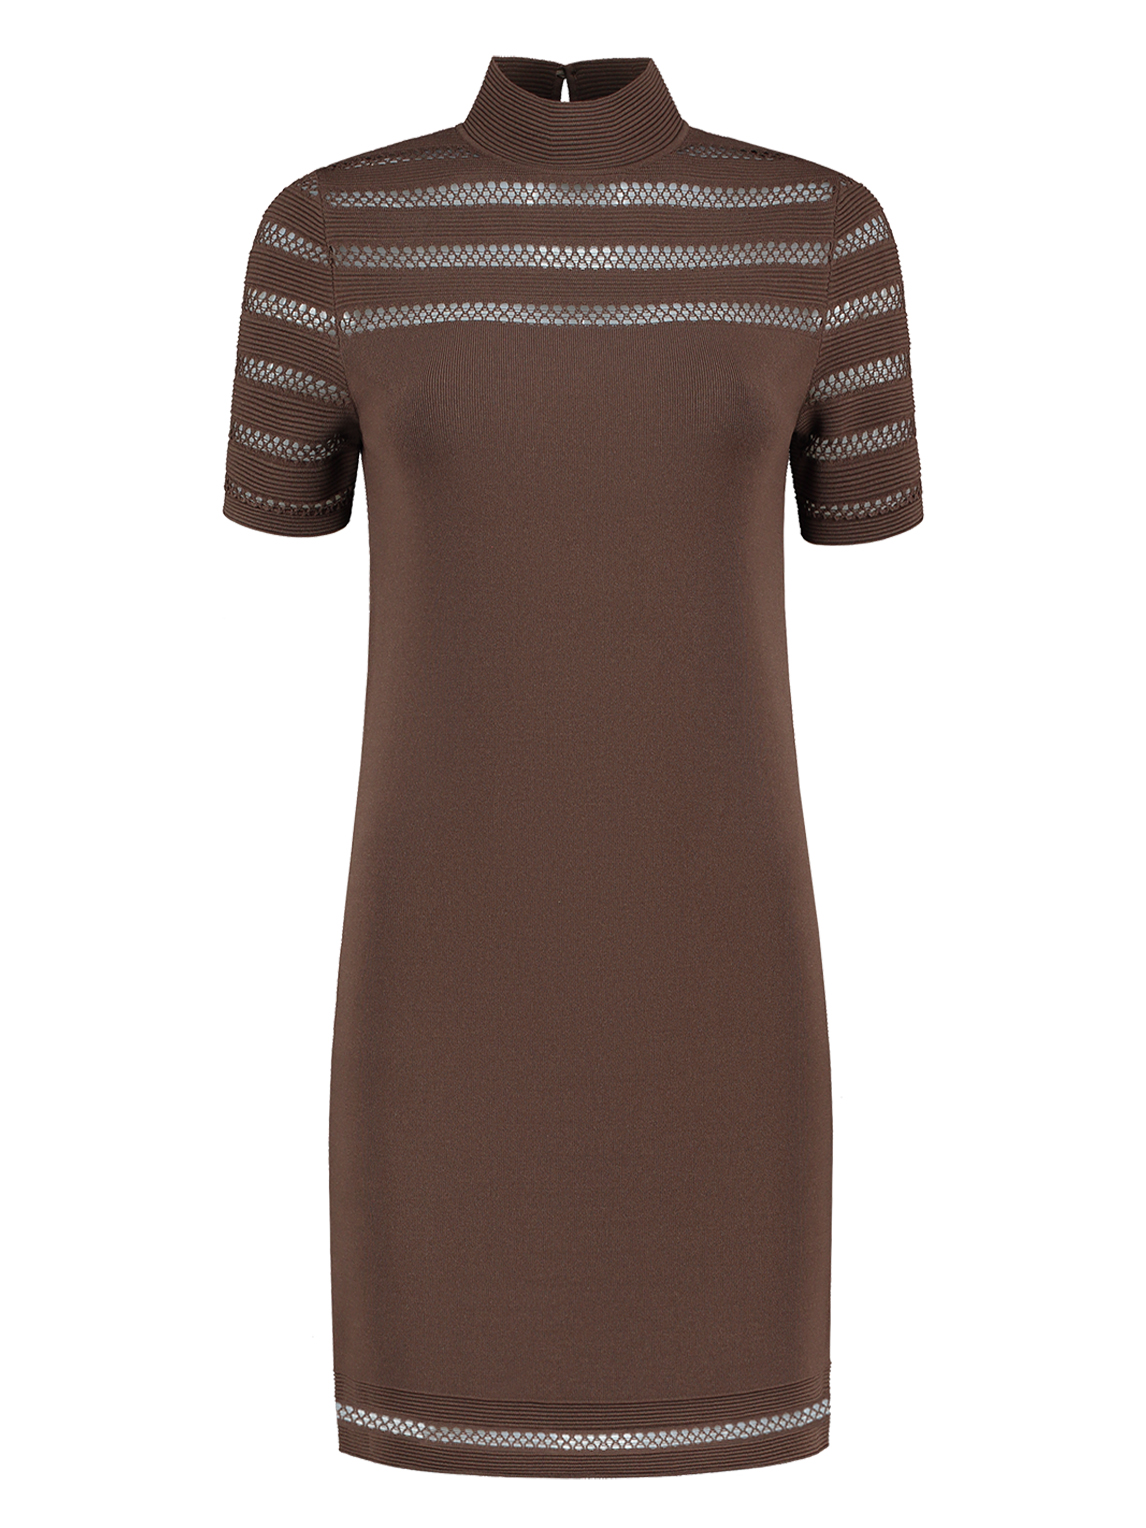 Donker bruine dames jurk Nikkie - Kacy Dress - N7-482 1905 5506